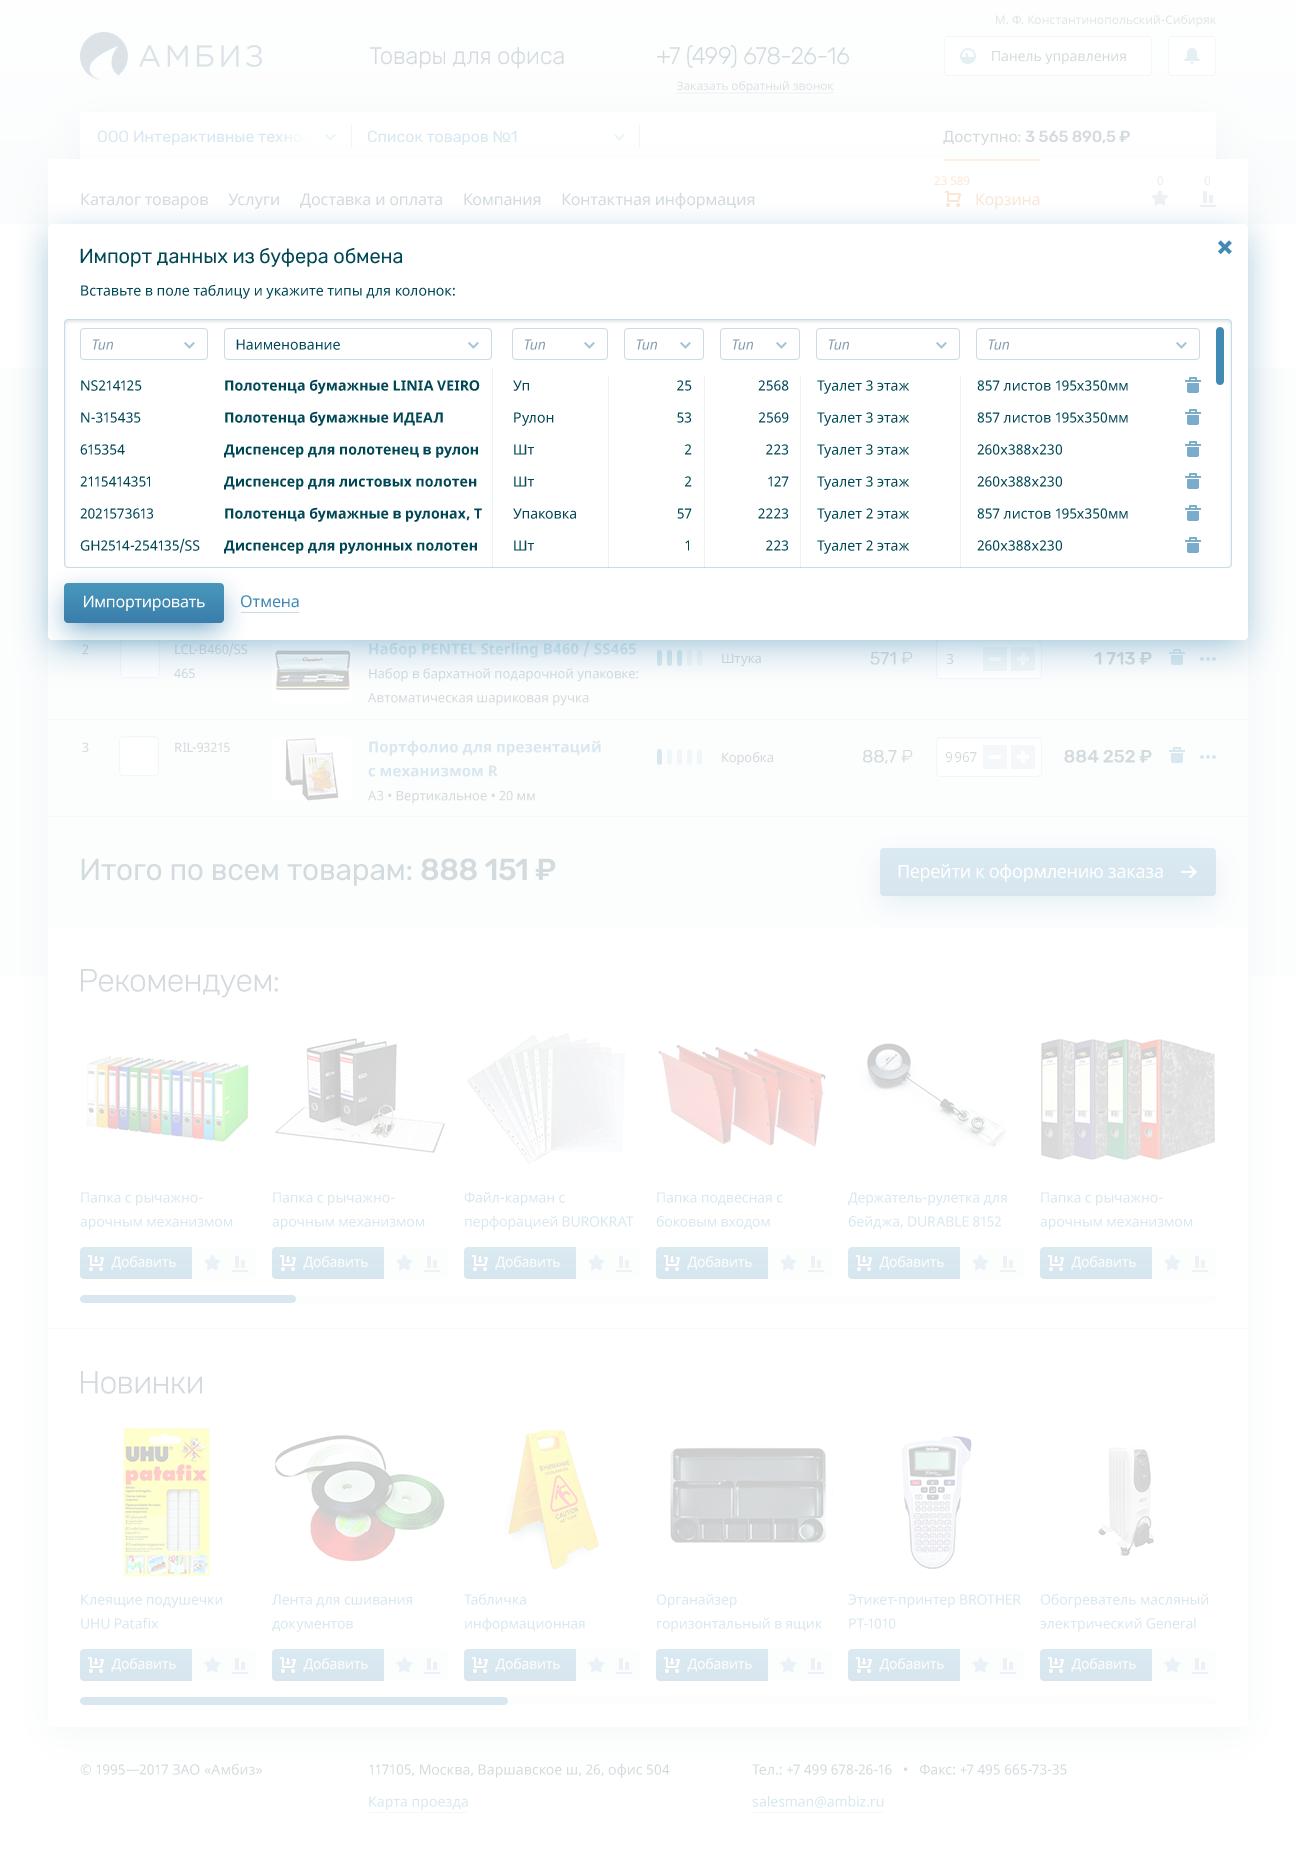 Корзина с товарами _ Товары с тегами и описанием _ Импорт данных _ Импорт данных из буфера.png